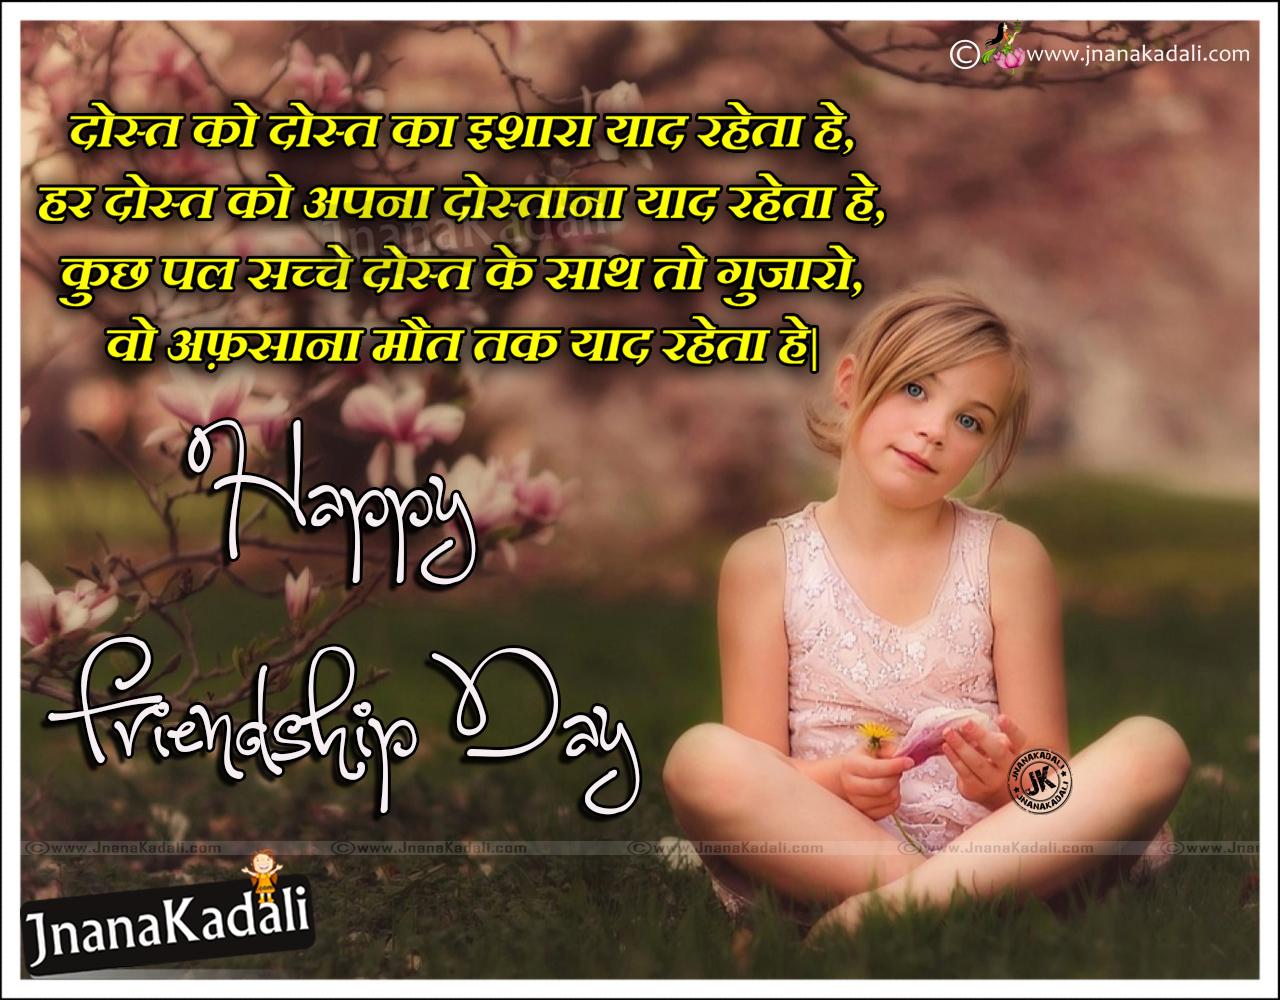 Friendship Hindi Shayari with cute Childrens HD Wallpapers ...